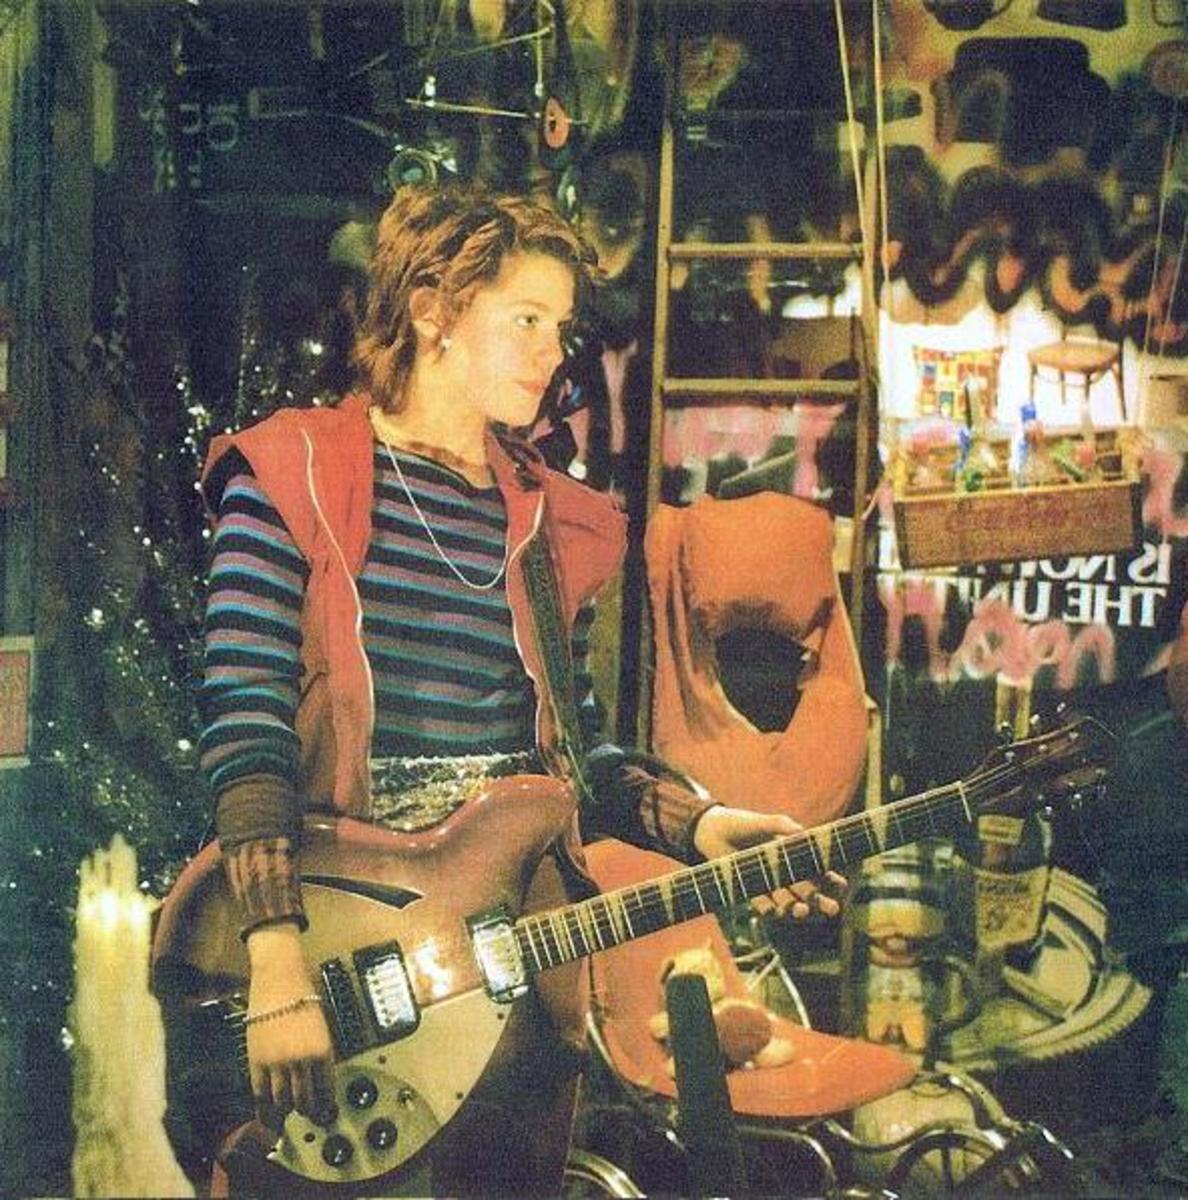 Robin Johnson in Times Square